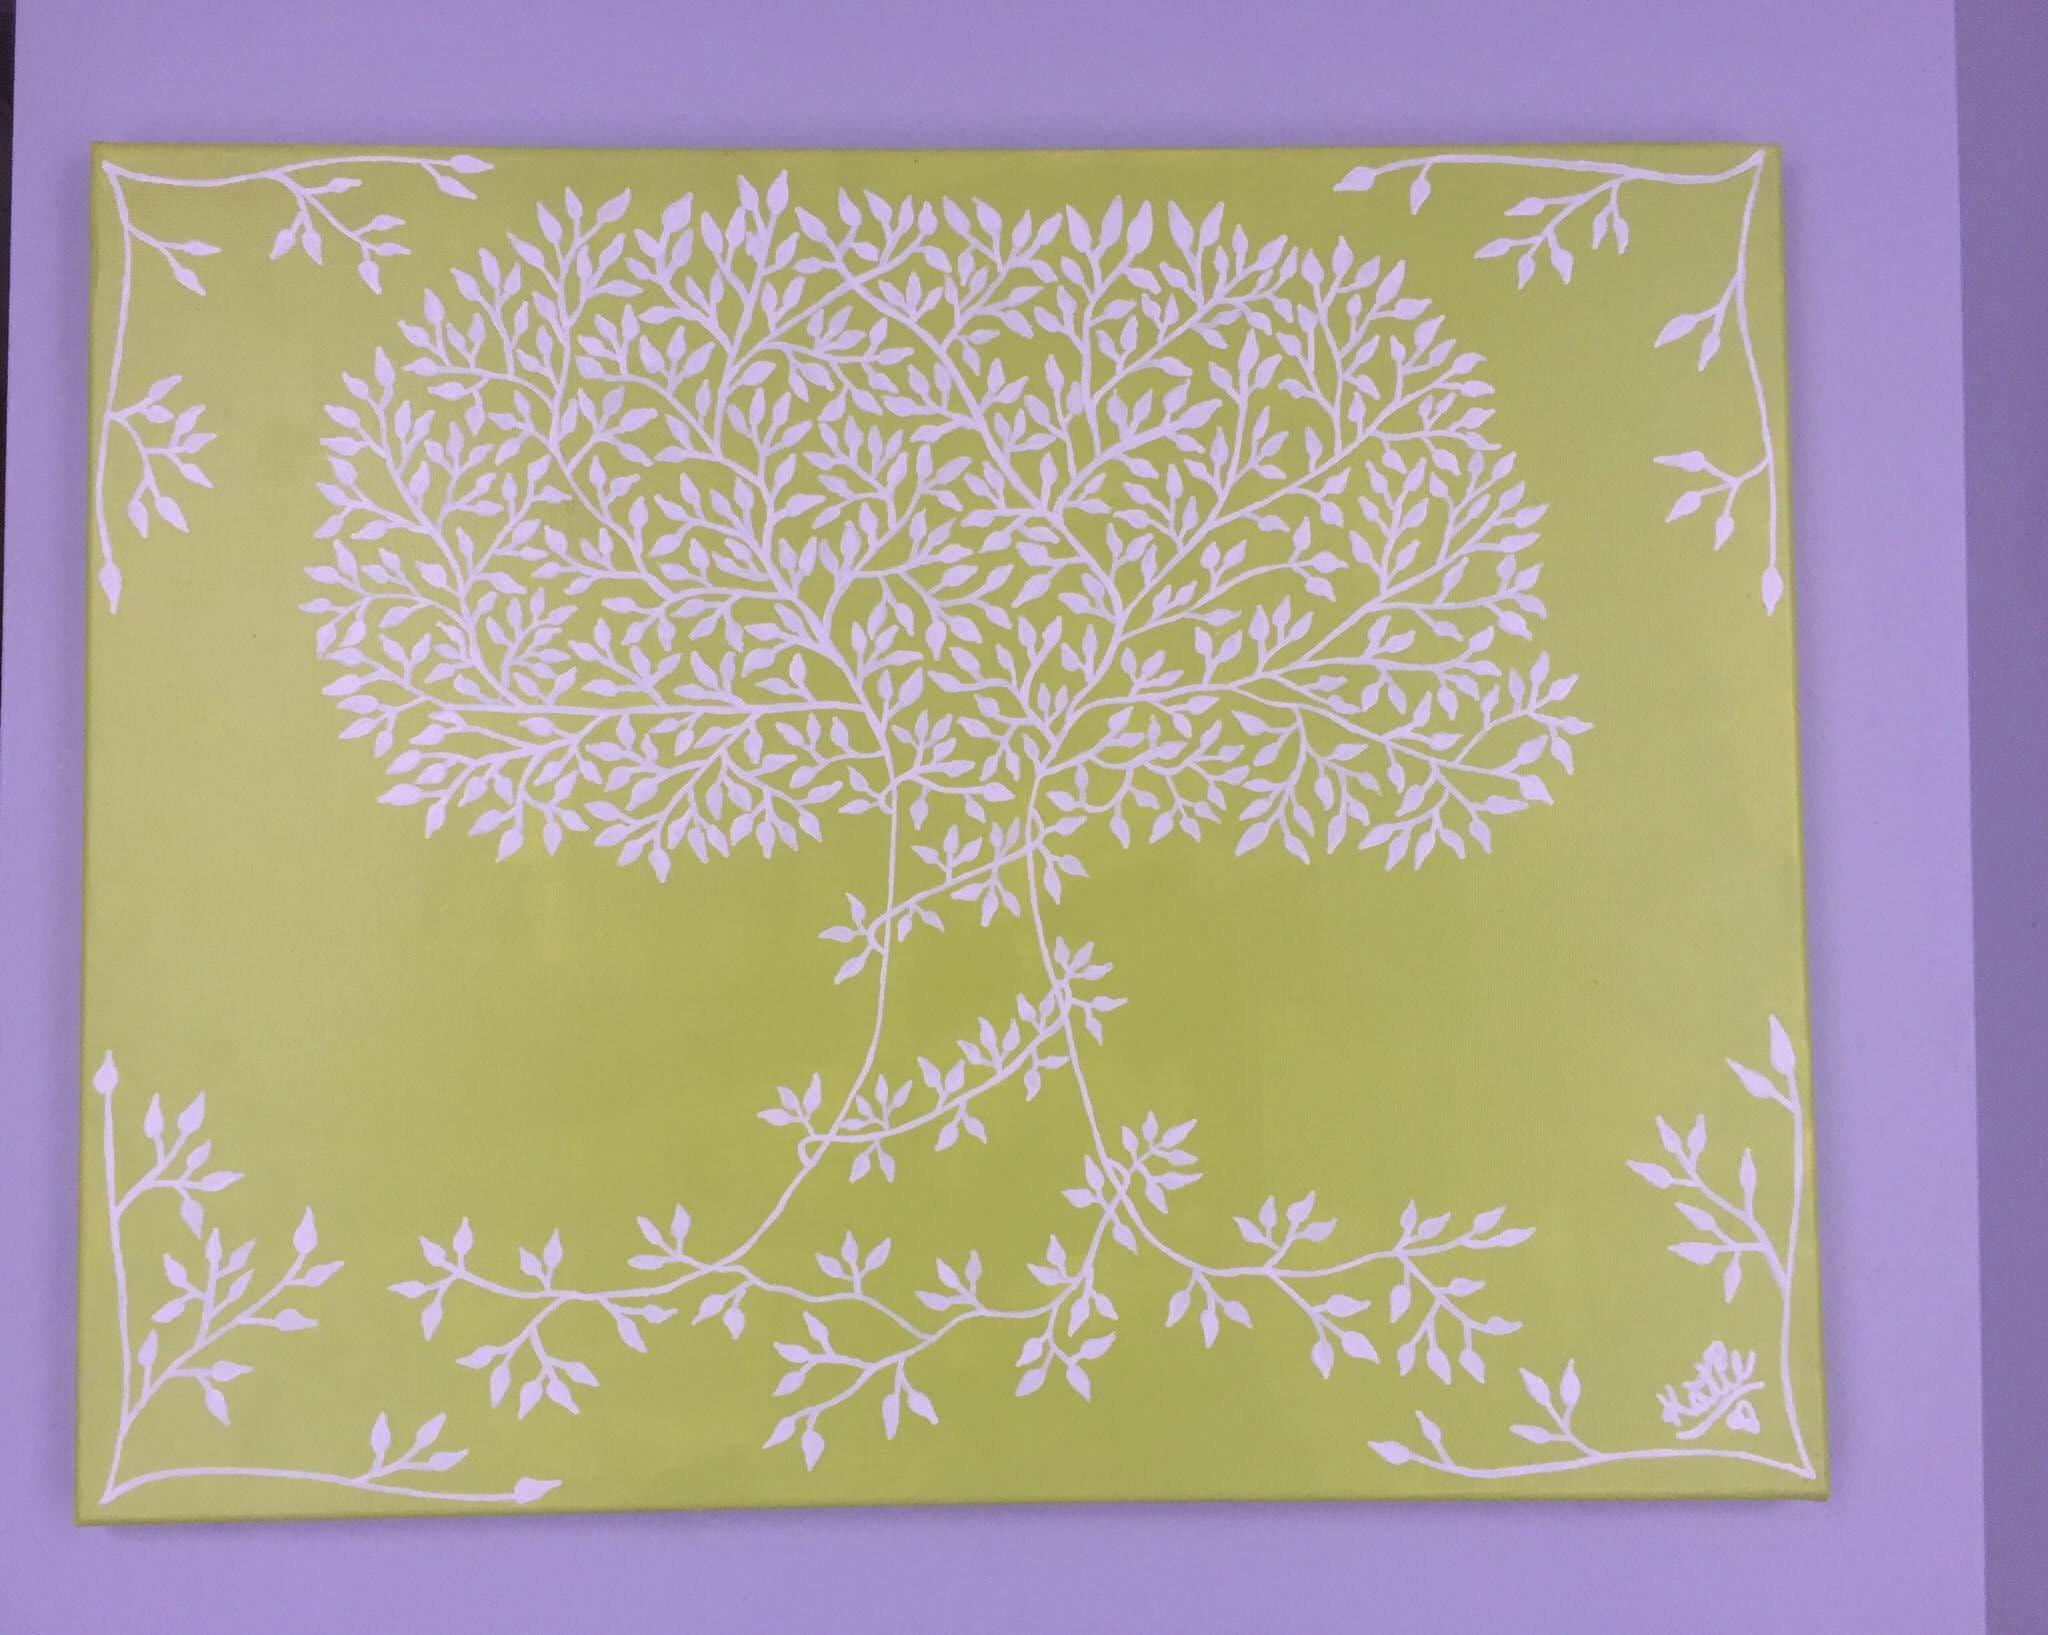 Primitive Tree Painting Green-Wall Decor Wall Art Wedding | Etsy